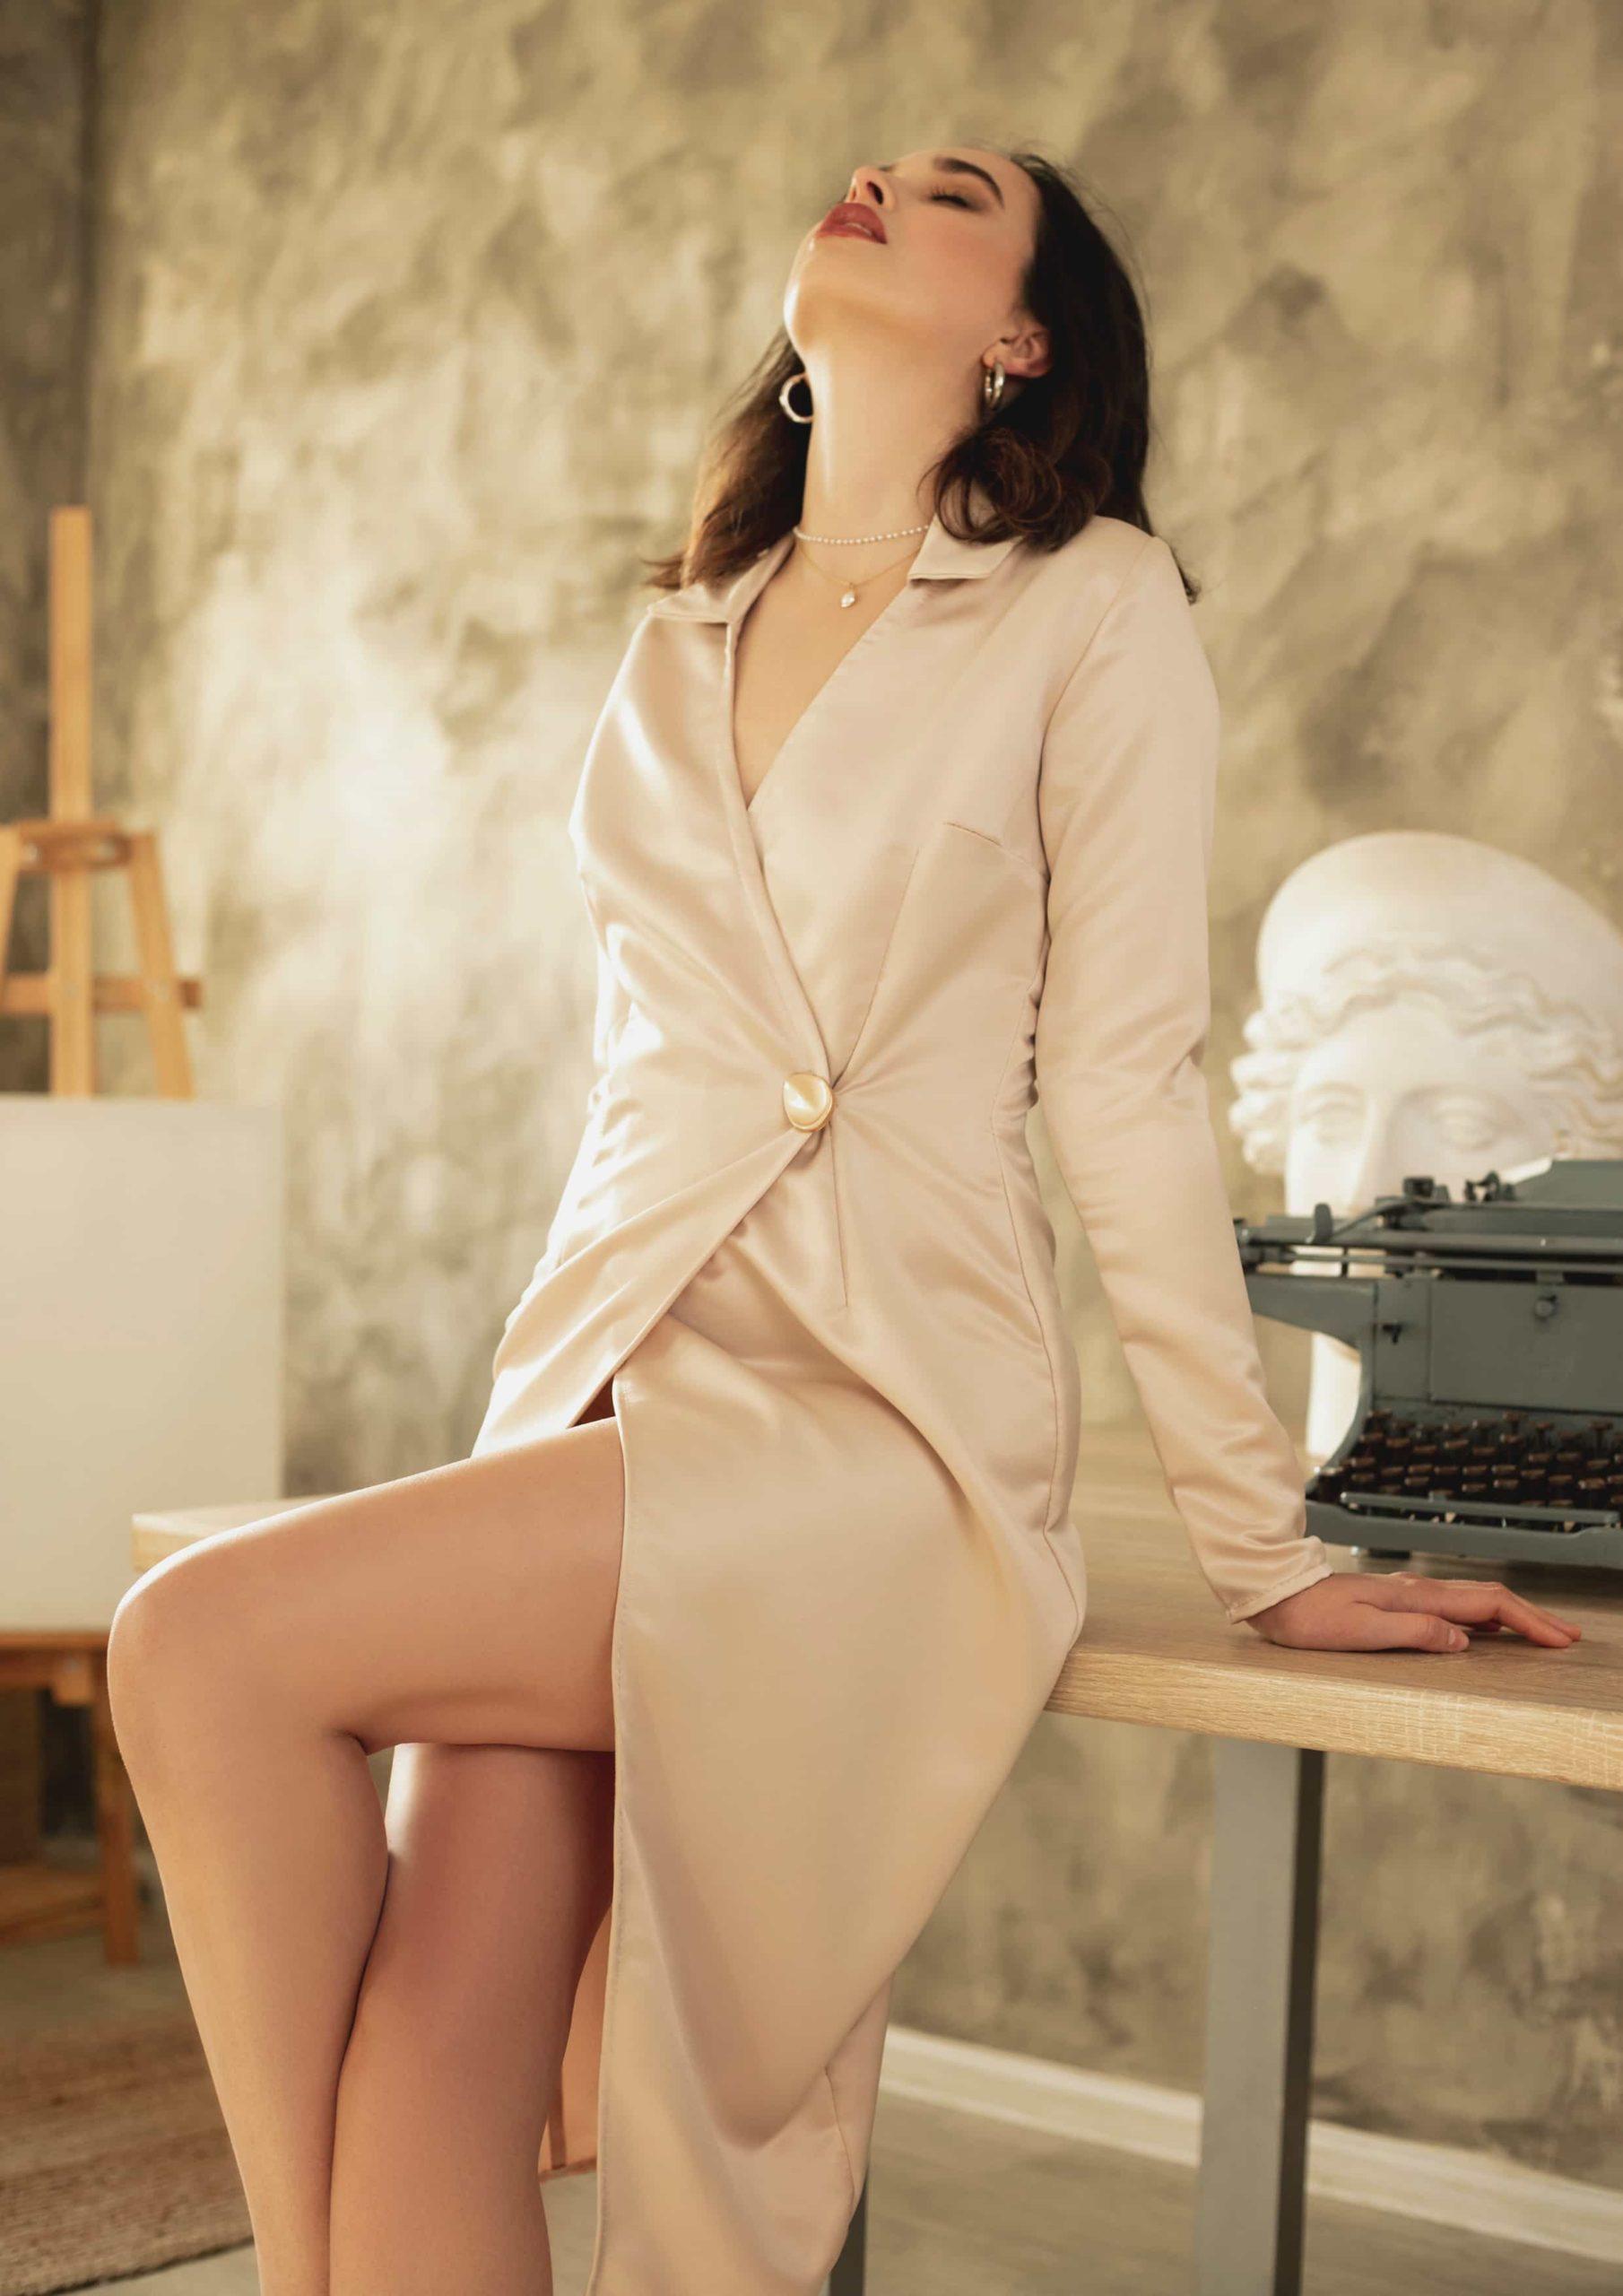 Dress elegant fashion style your musa la musa model 2020 2021